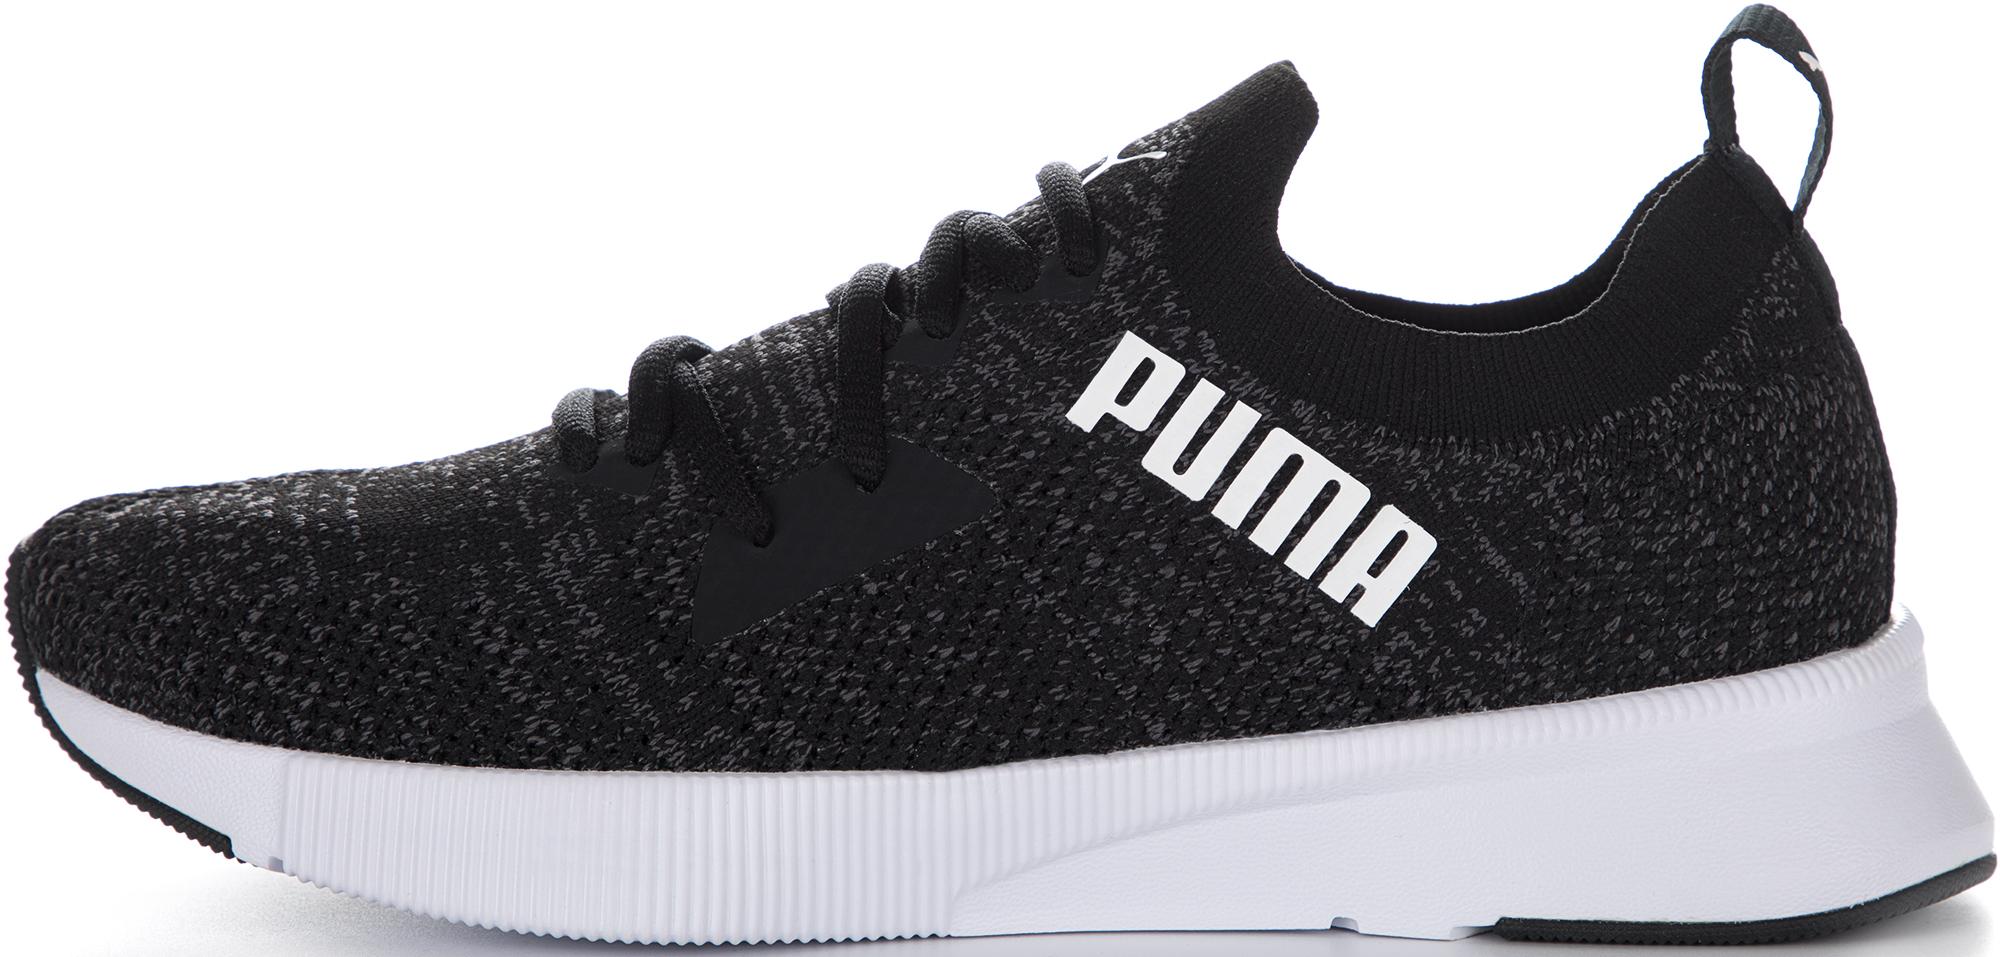 Puma Кроссовки женские Puma Flyer Runner Engineer, размер 40 цены